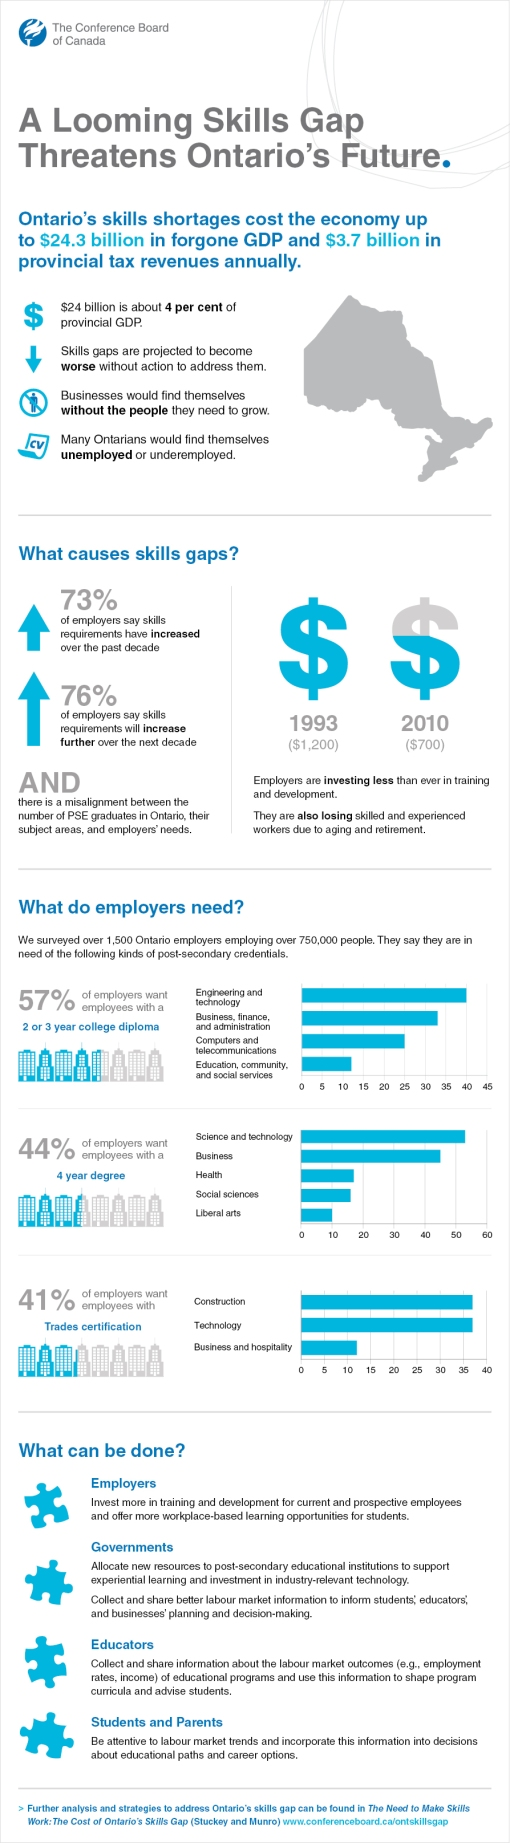 skillsgap_infographic